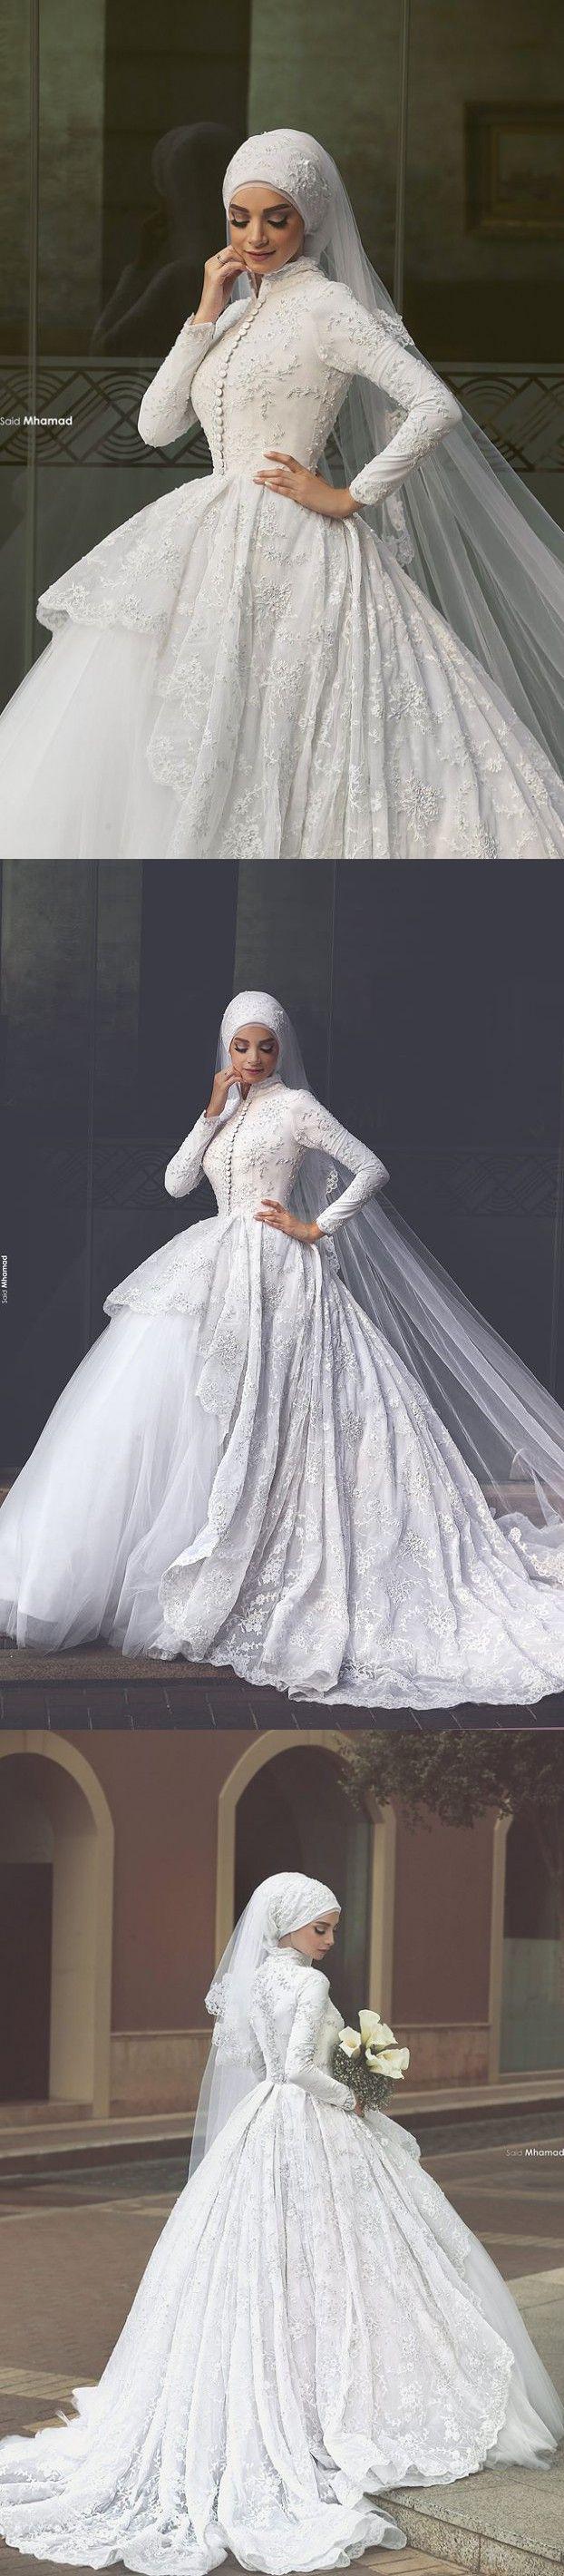 Robe de Mariage Hijab Wedding Gowns Long Sleeve Ball Gown Wedding Dresses 2016 High Neck Lace Vestidos de Noiva $220